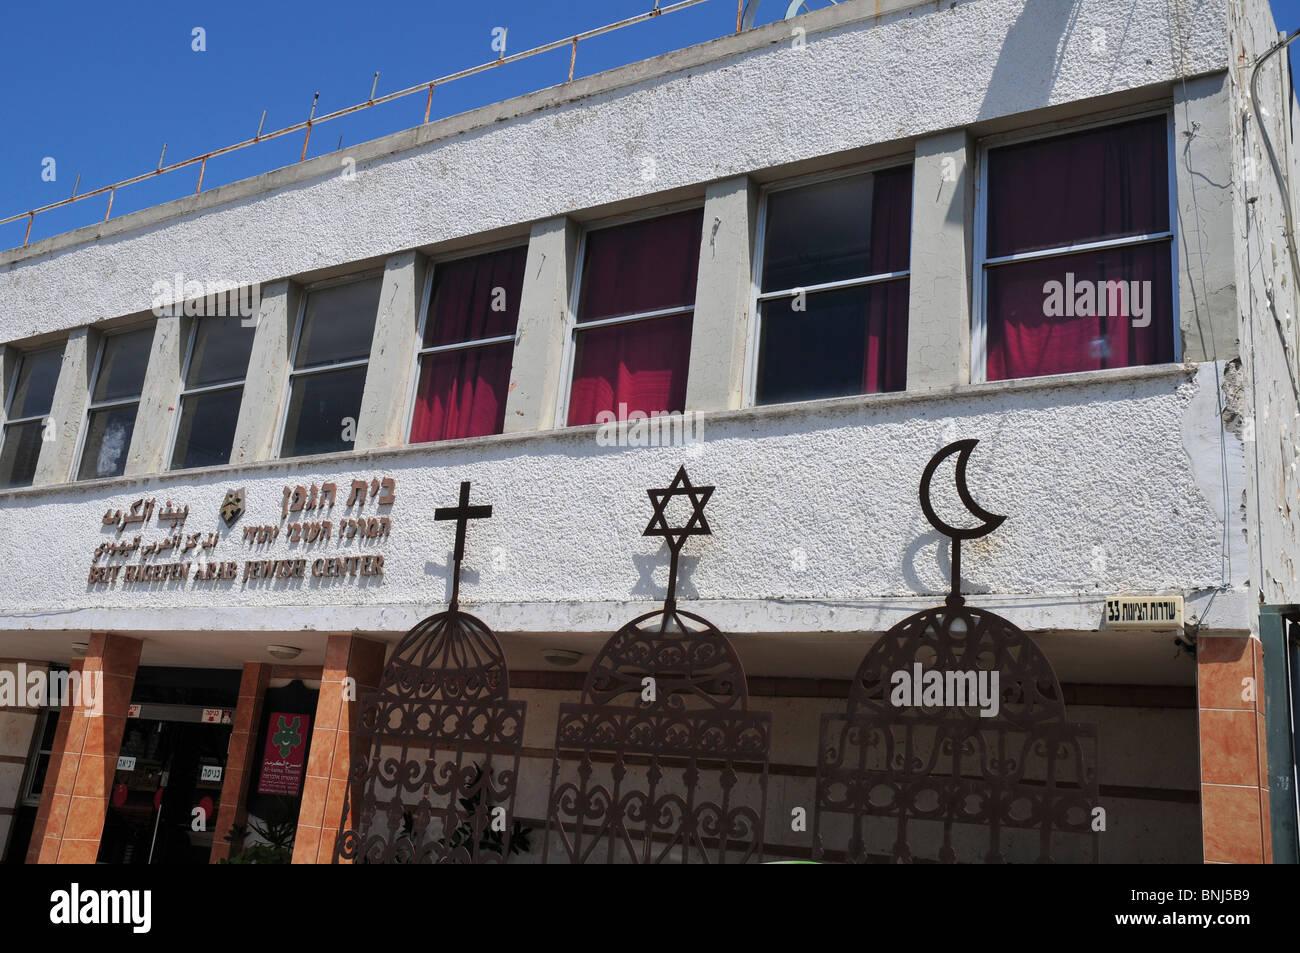 Israel, Haifa, The signs of the three major religions, Christianity, Judaism and Islam at Beit Hagefen Arab, Jewish - Stock Image